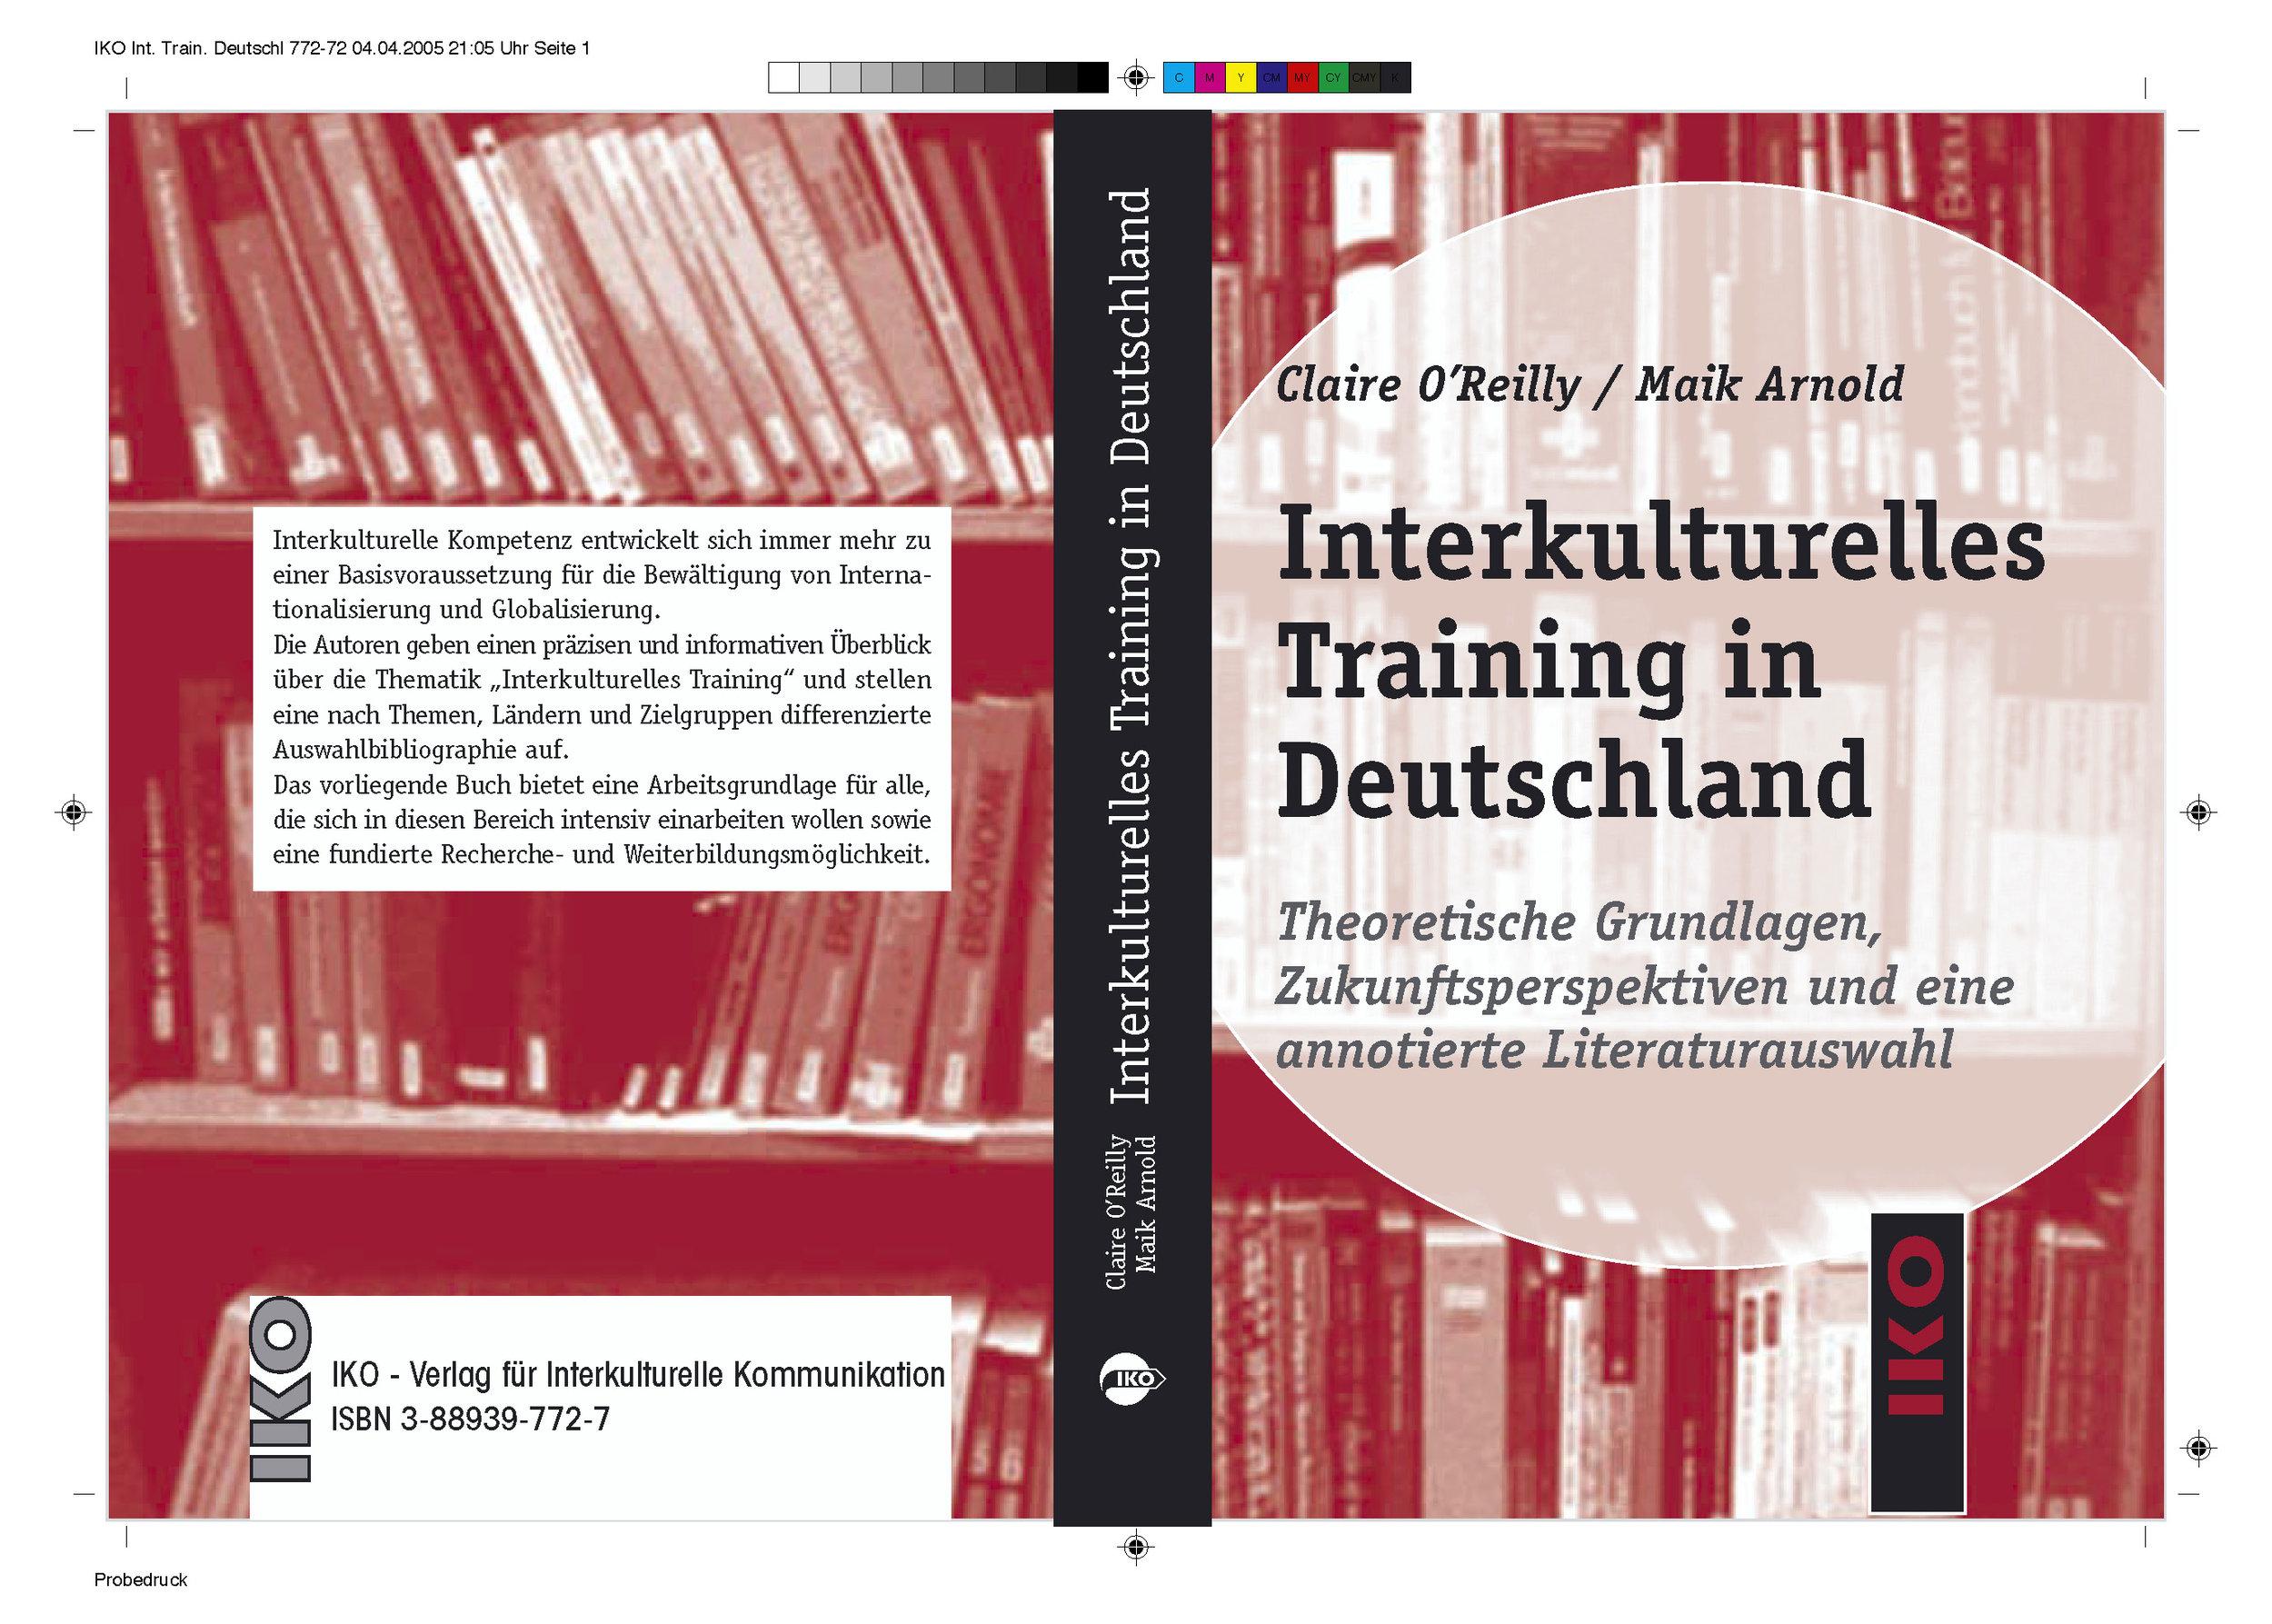 Intercultural Trainings in Germany